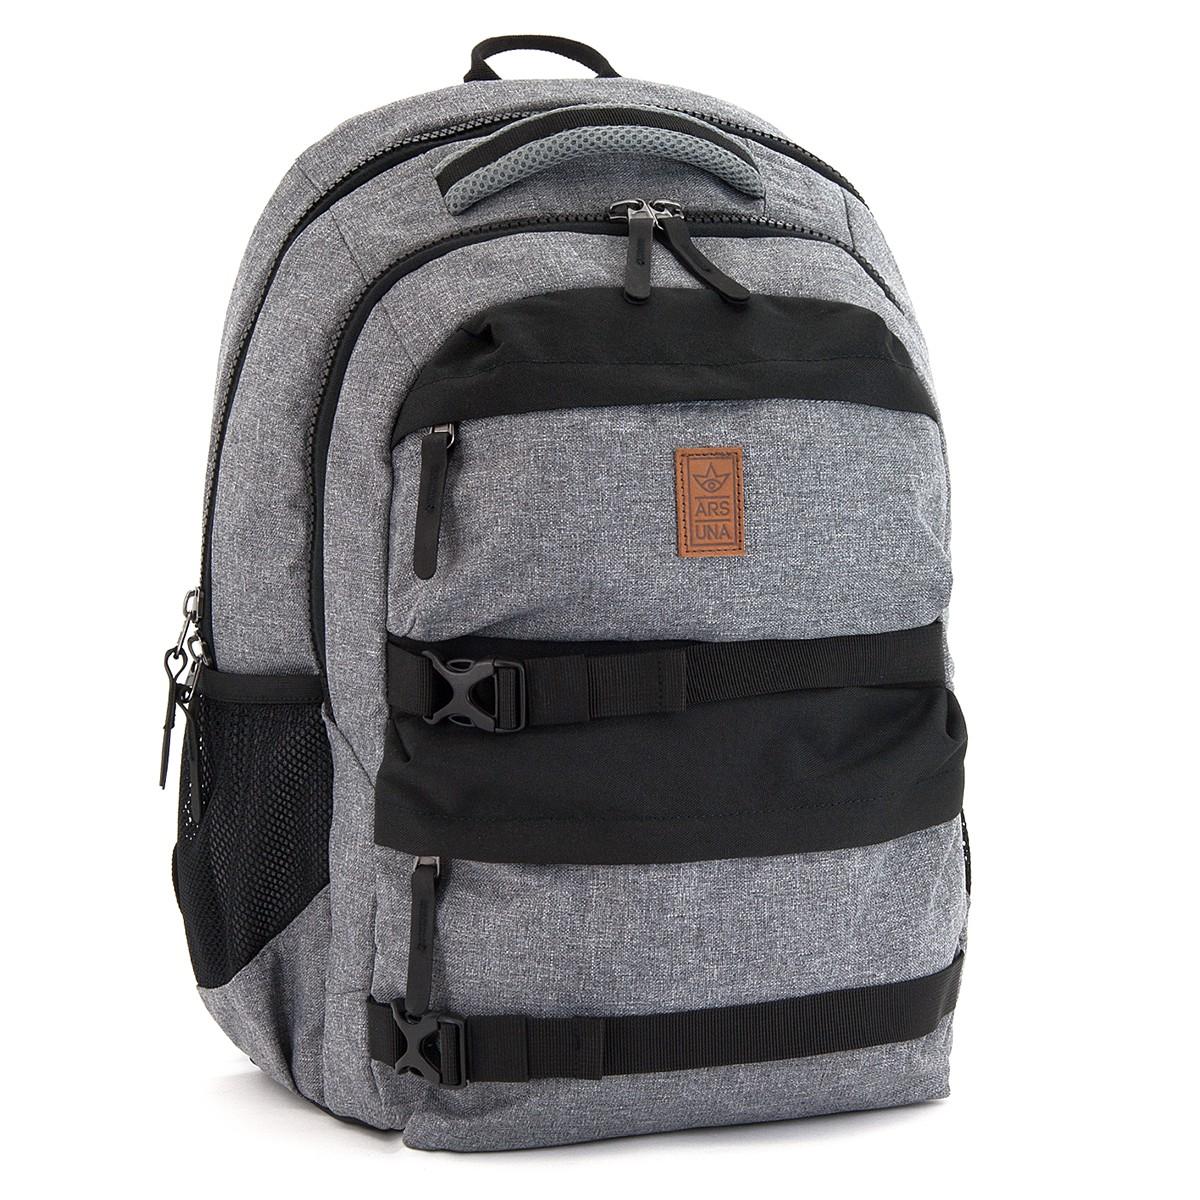 ARS UNA 07 ergonomikus hátizsák 590f2db05a